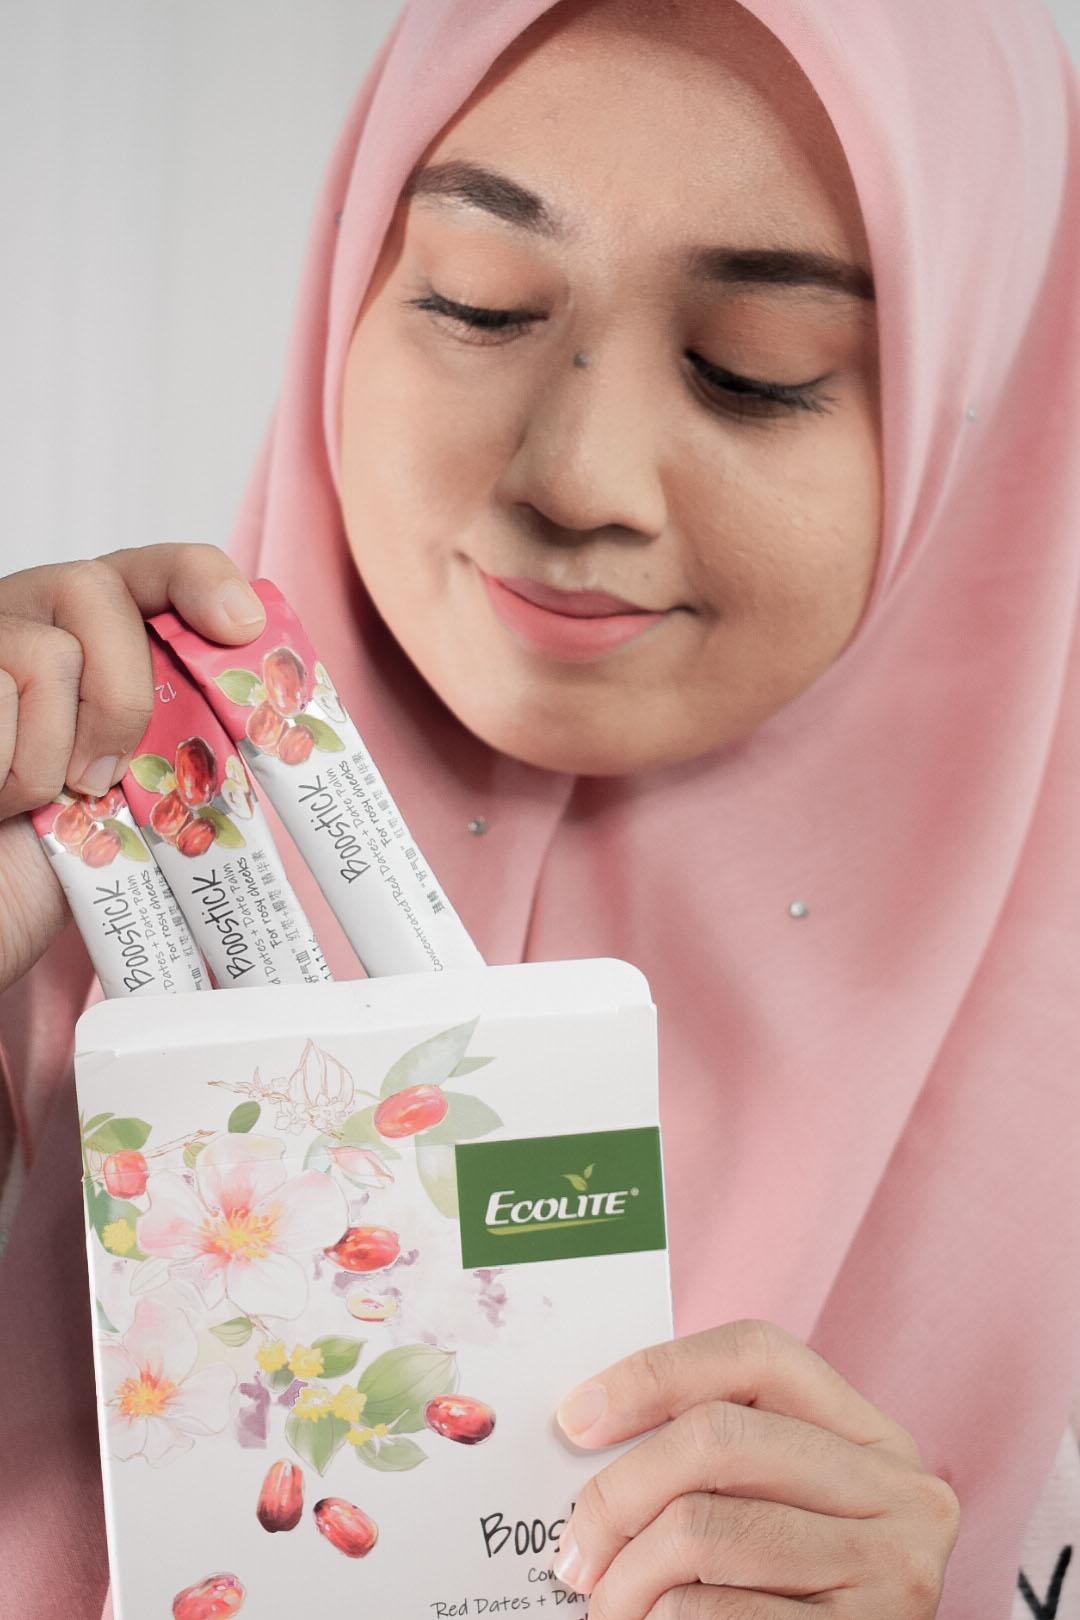 Ecolite Boostick Beri Tenaga Untuk Badan, Cantikkan Kulit dan Legakan Keletihan Mata